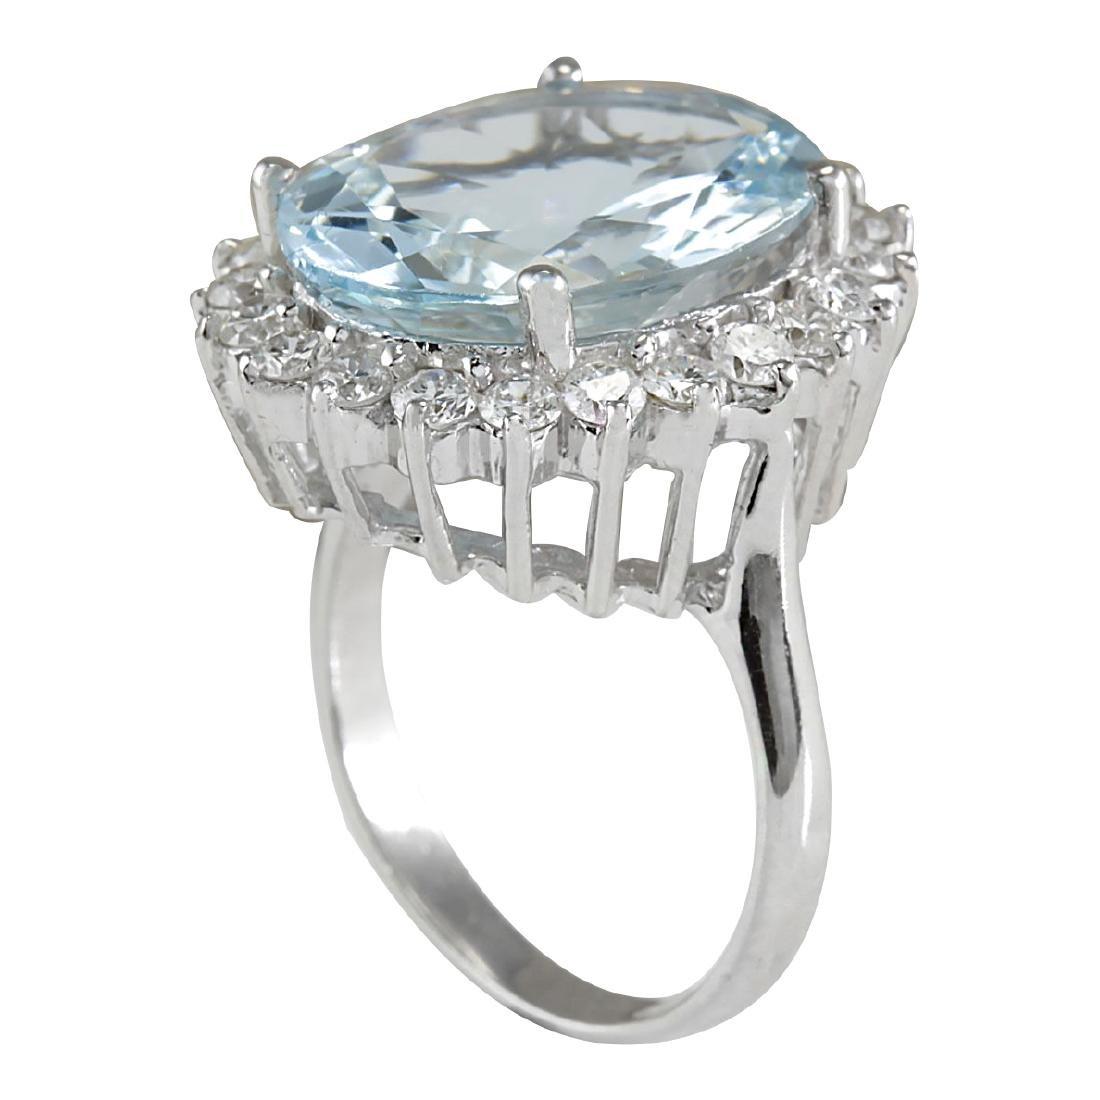 8.10CTW Natural Aquamarine And Diamond Ring In 18K - 3